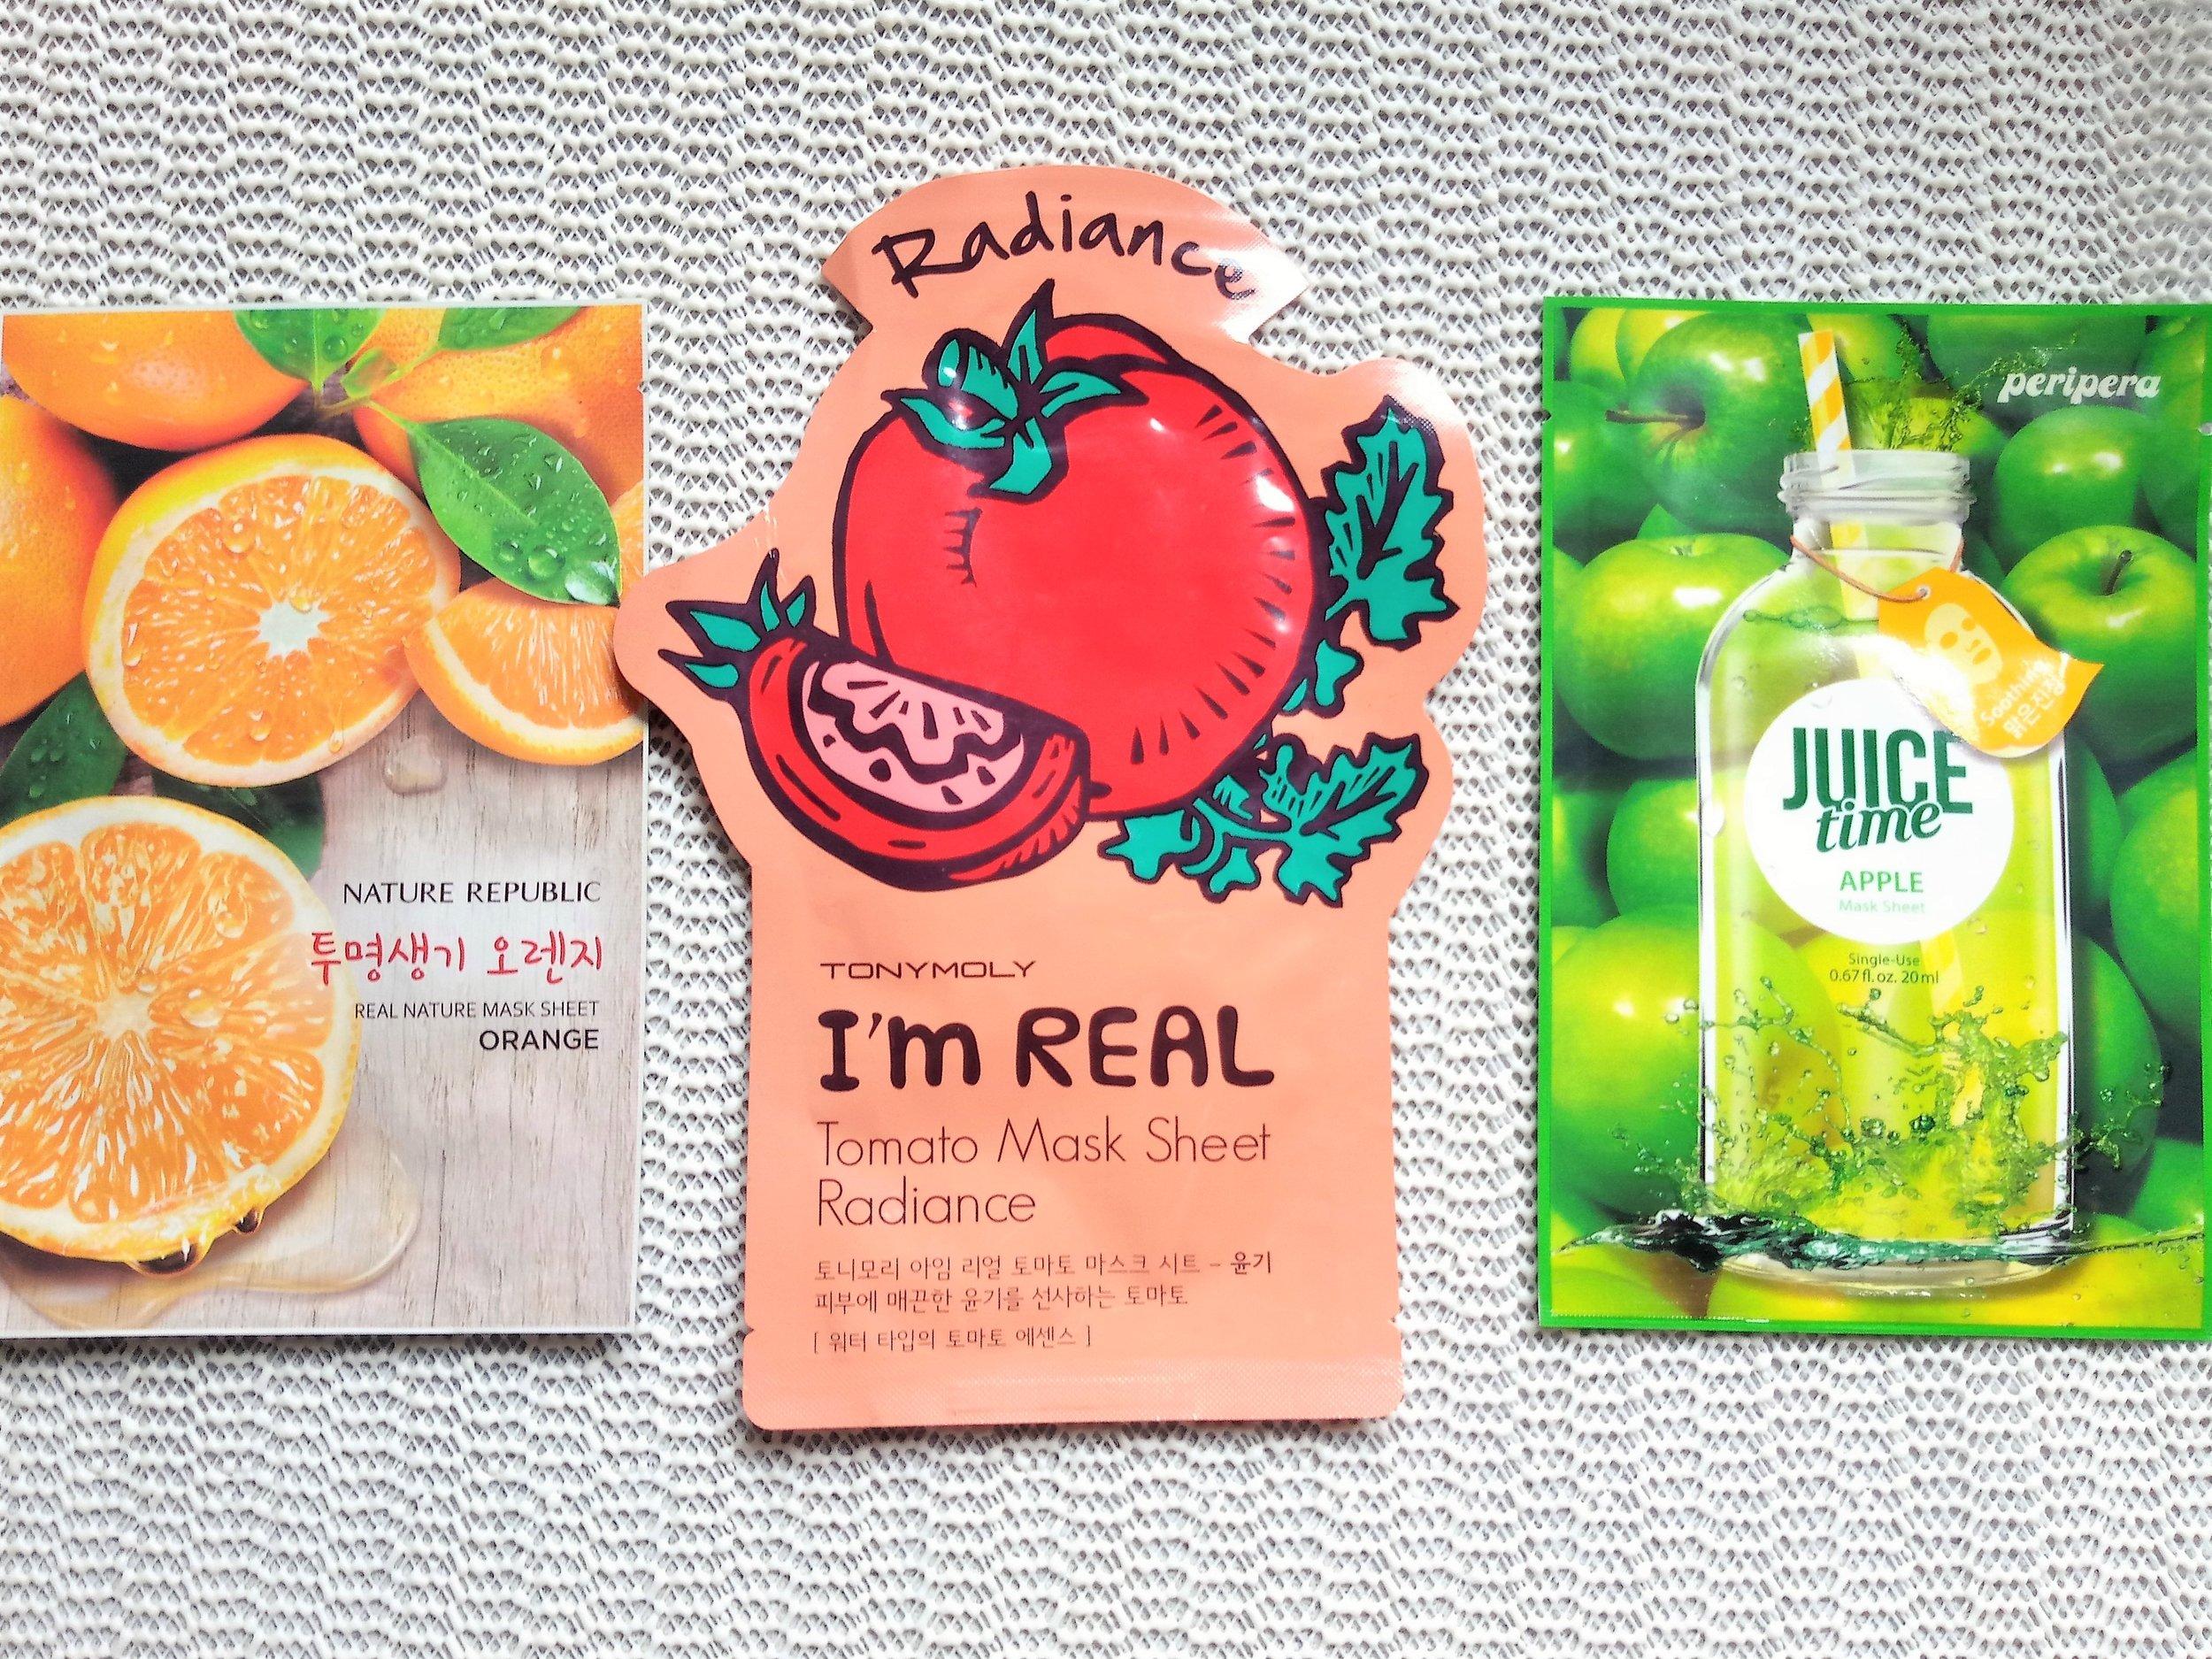 Nature Republic, TonyMoly, and PeriPera fruit sheet masks